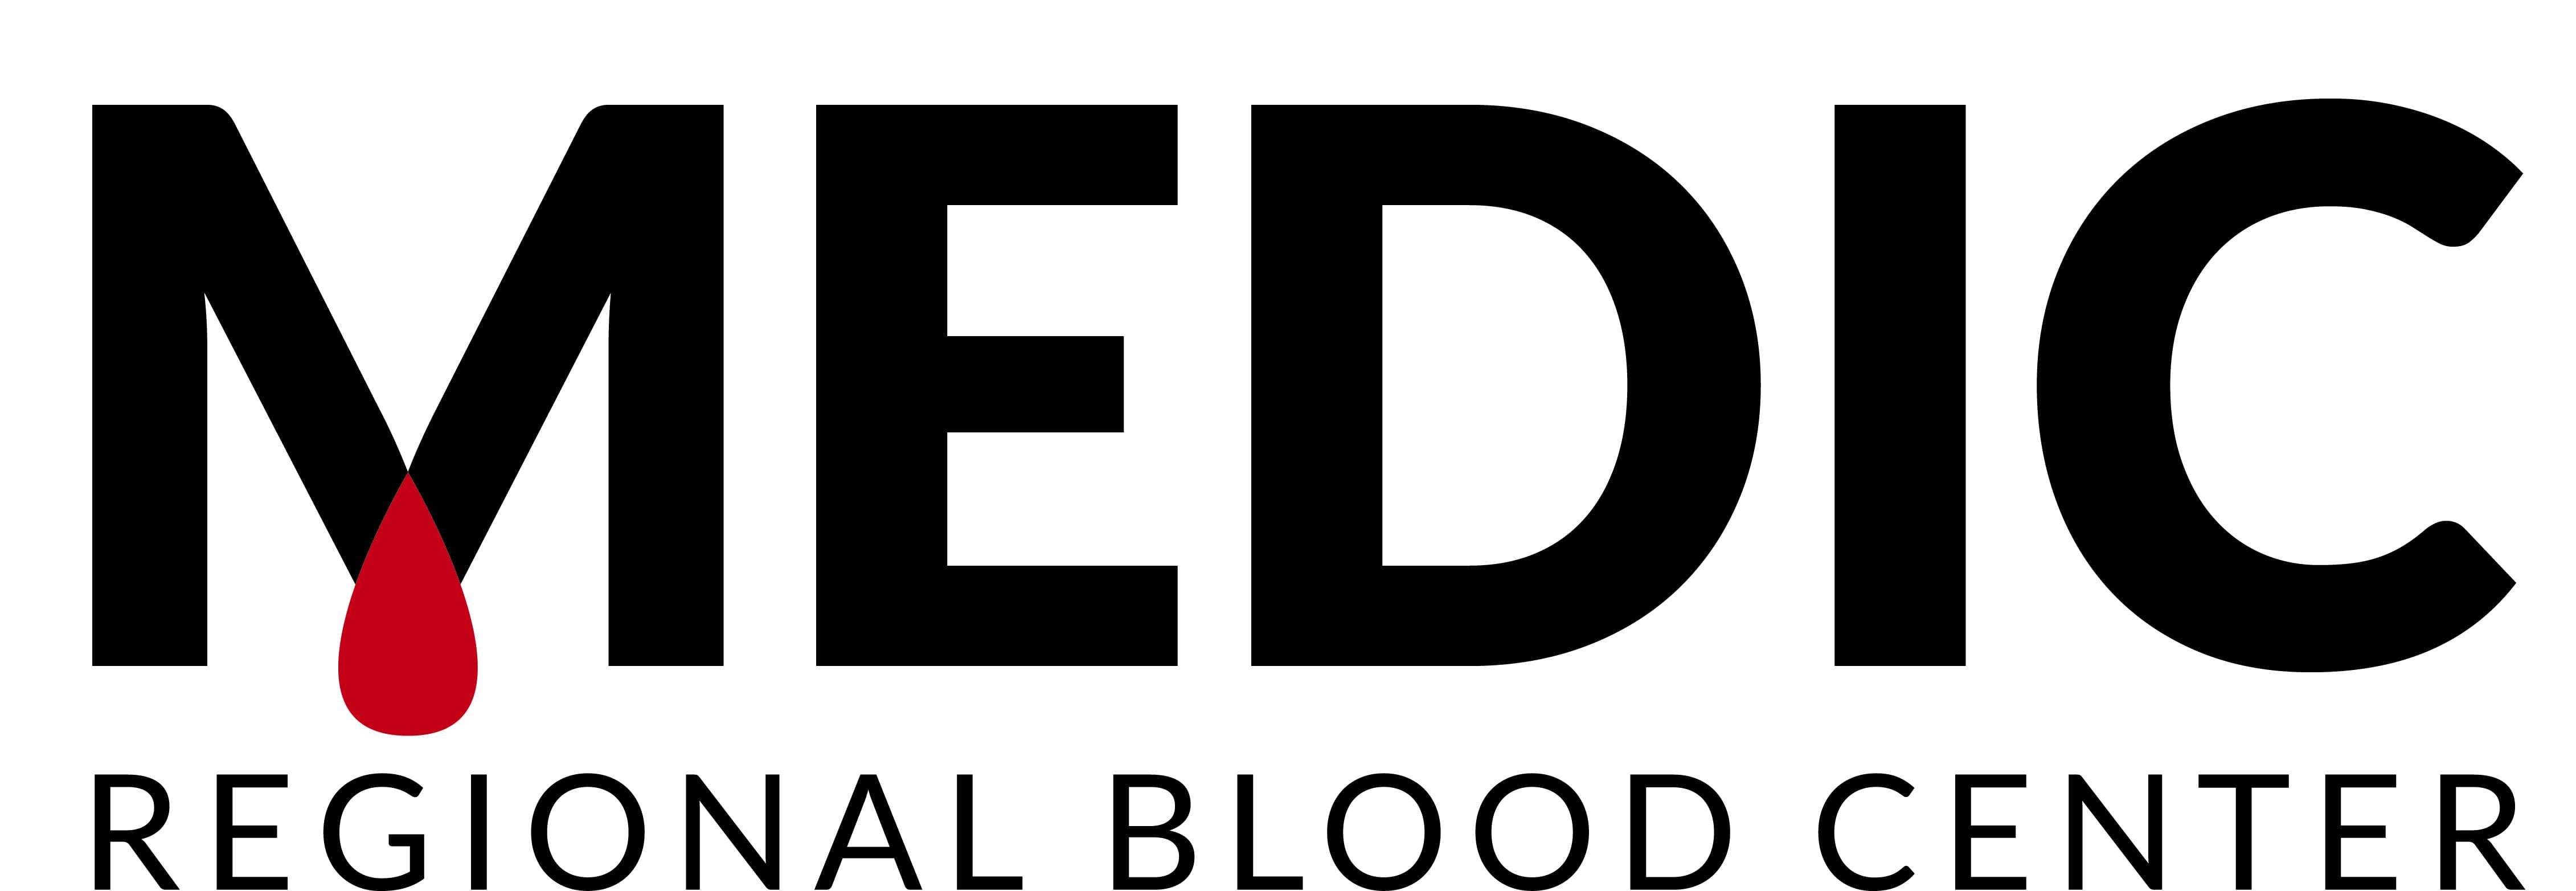 Medic Regional Blood Center Critical for O-